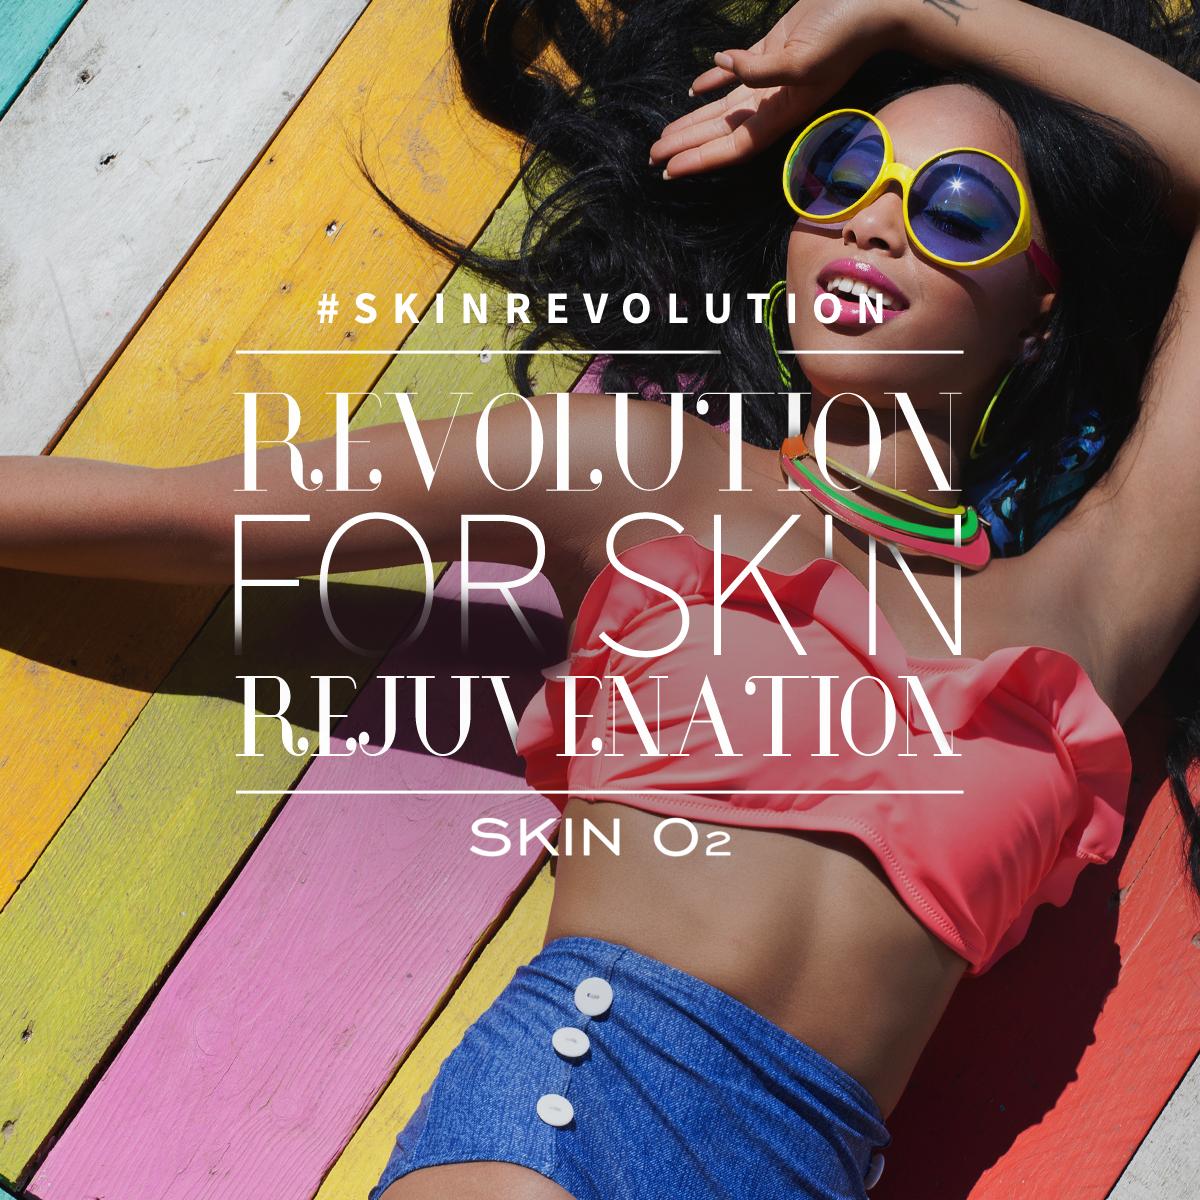 Pin on Skin Revolution